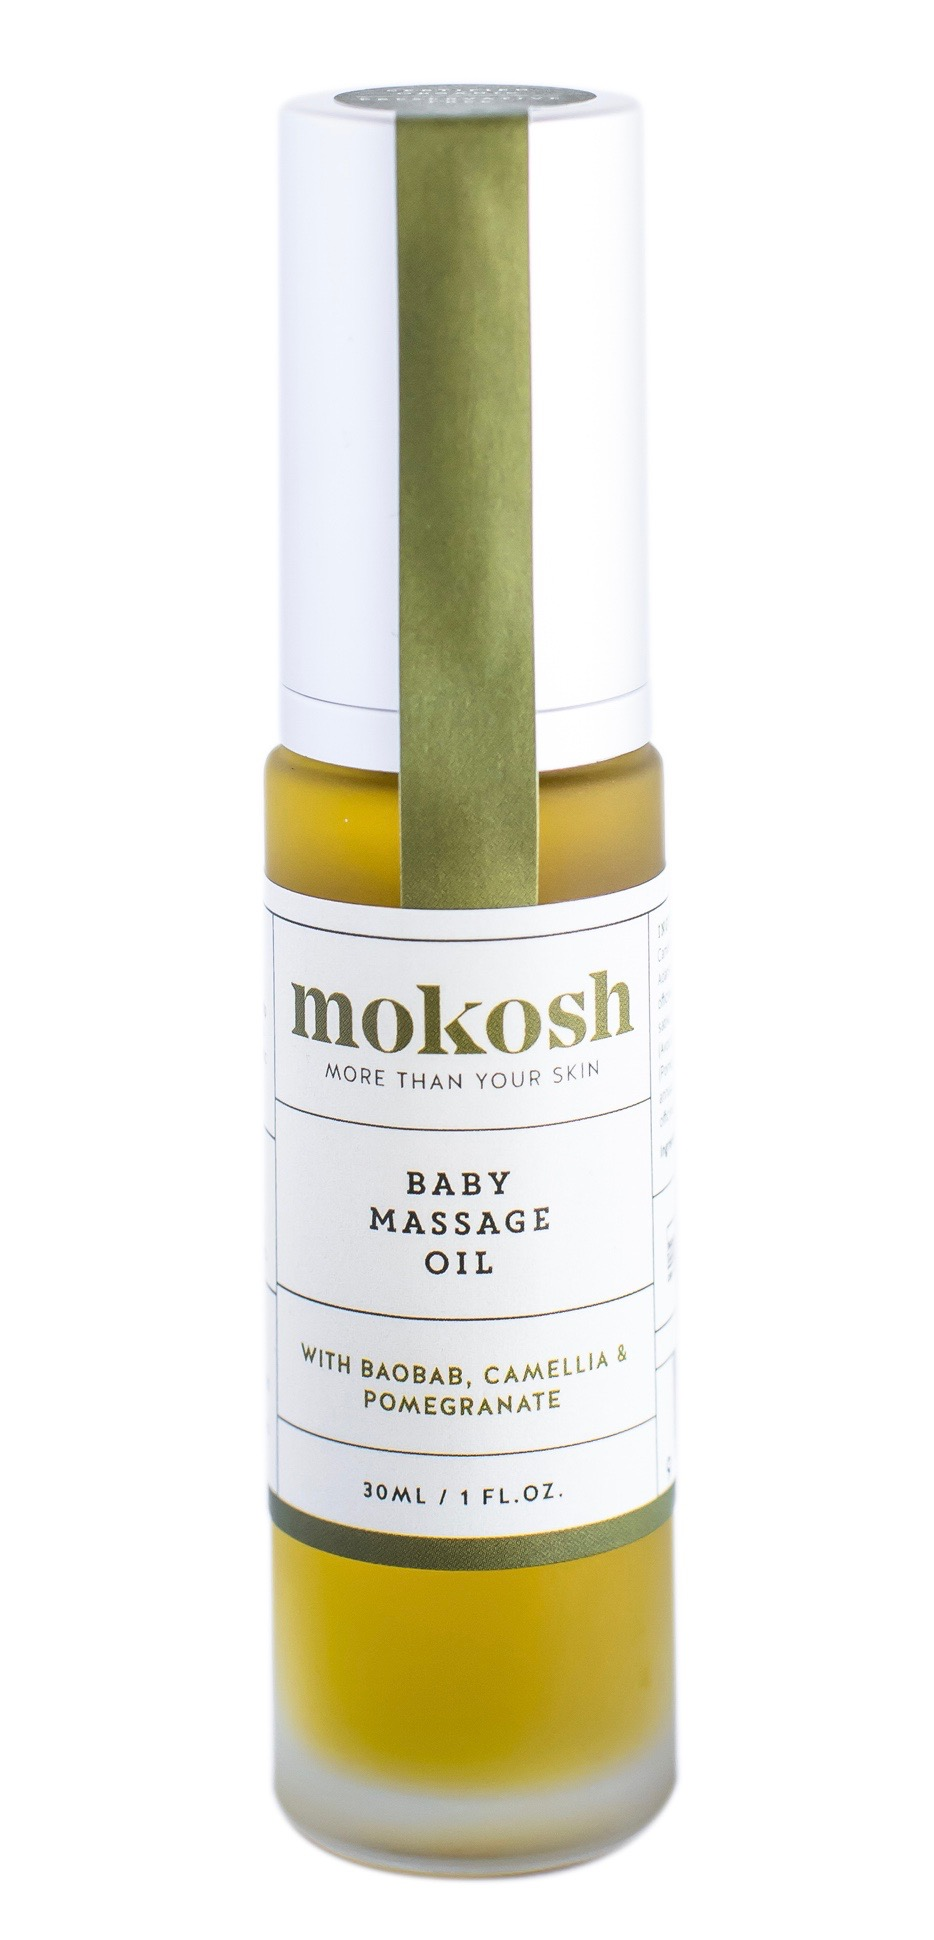 Mokosh Baby Massage Oil